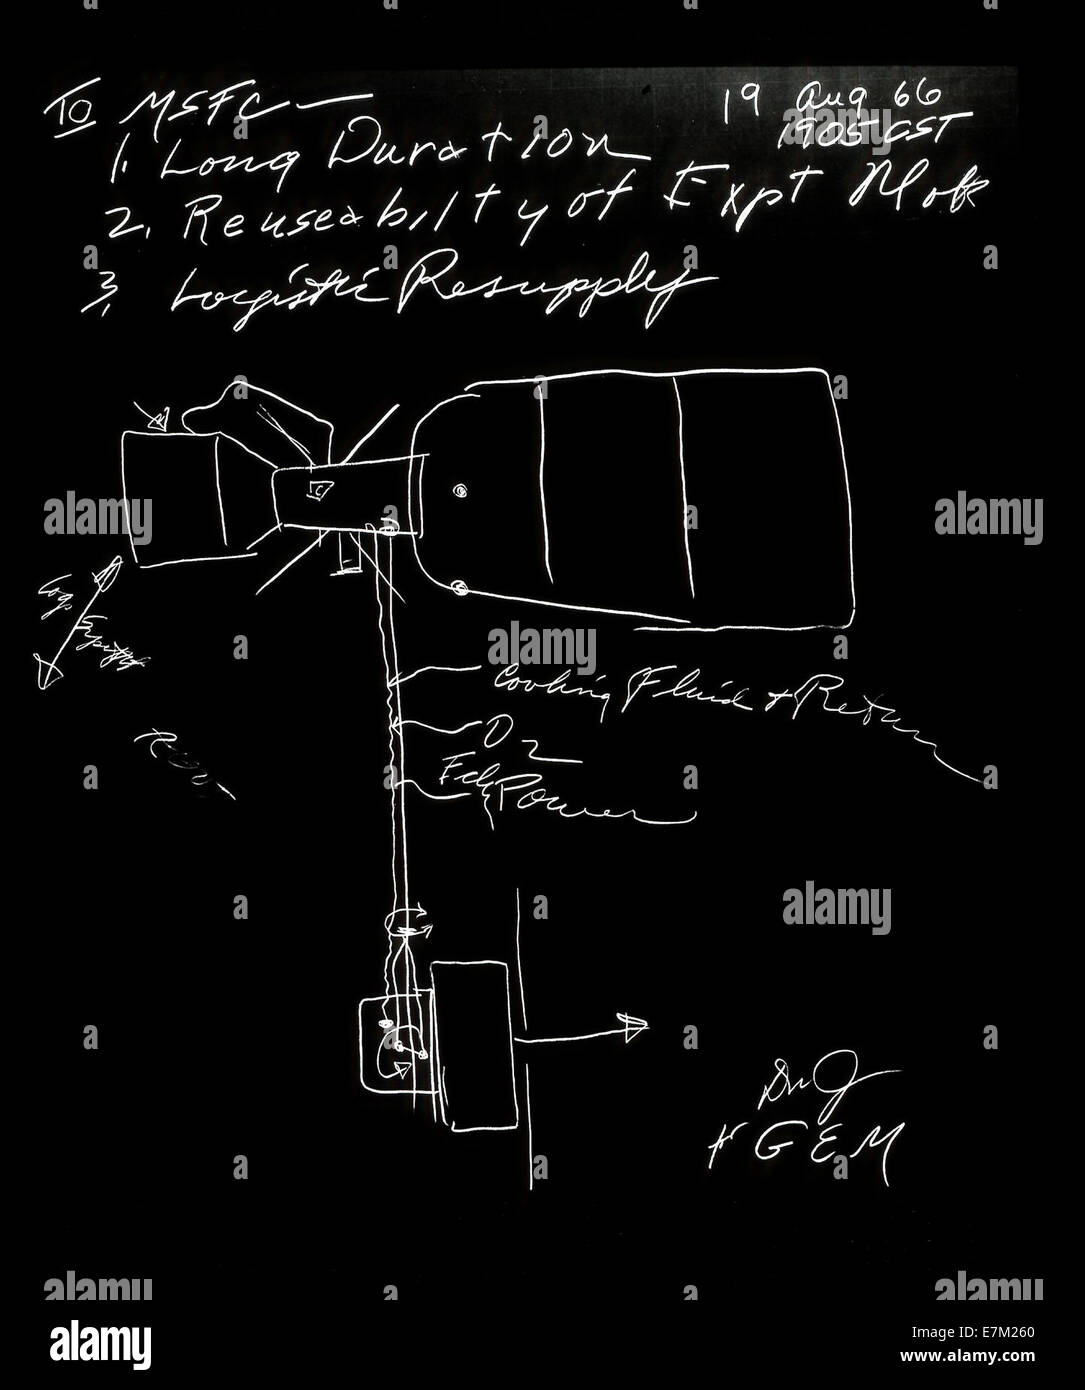 Skylab-Konzept von George Mueller Stockbild